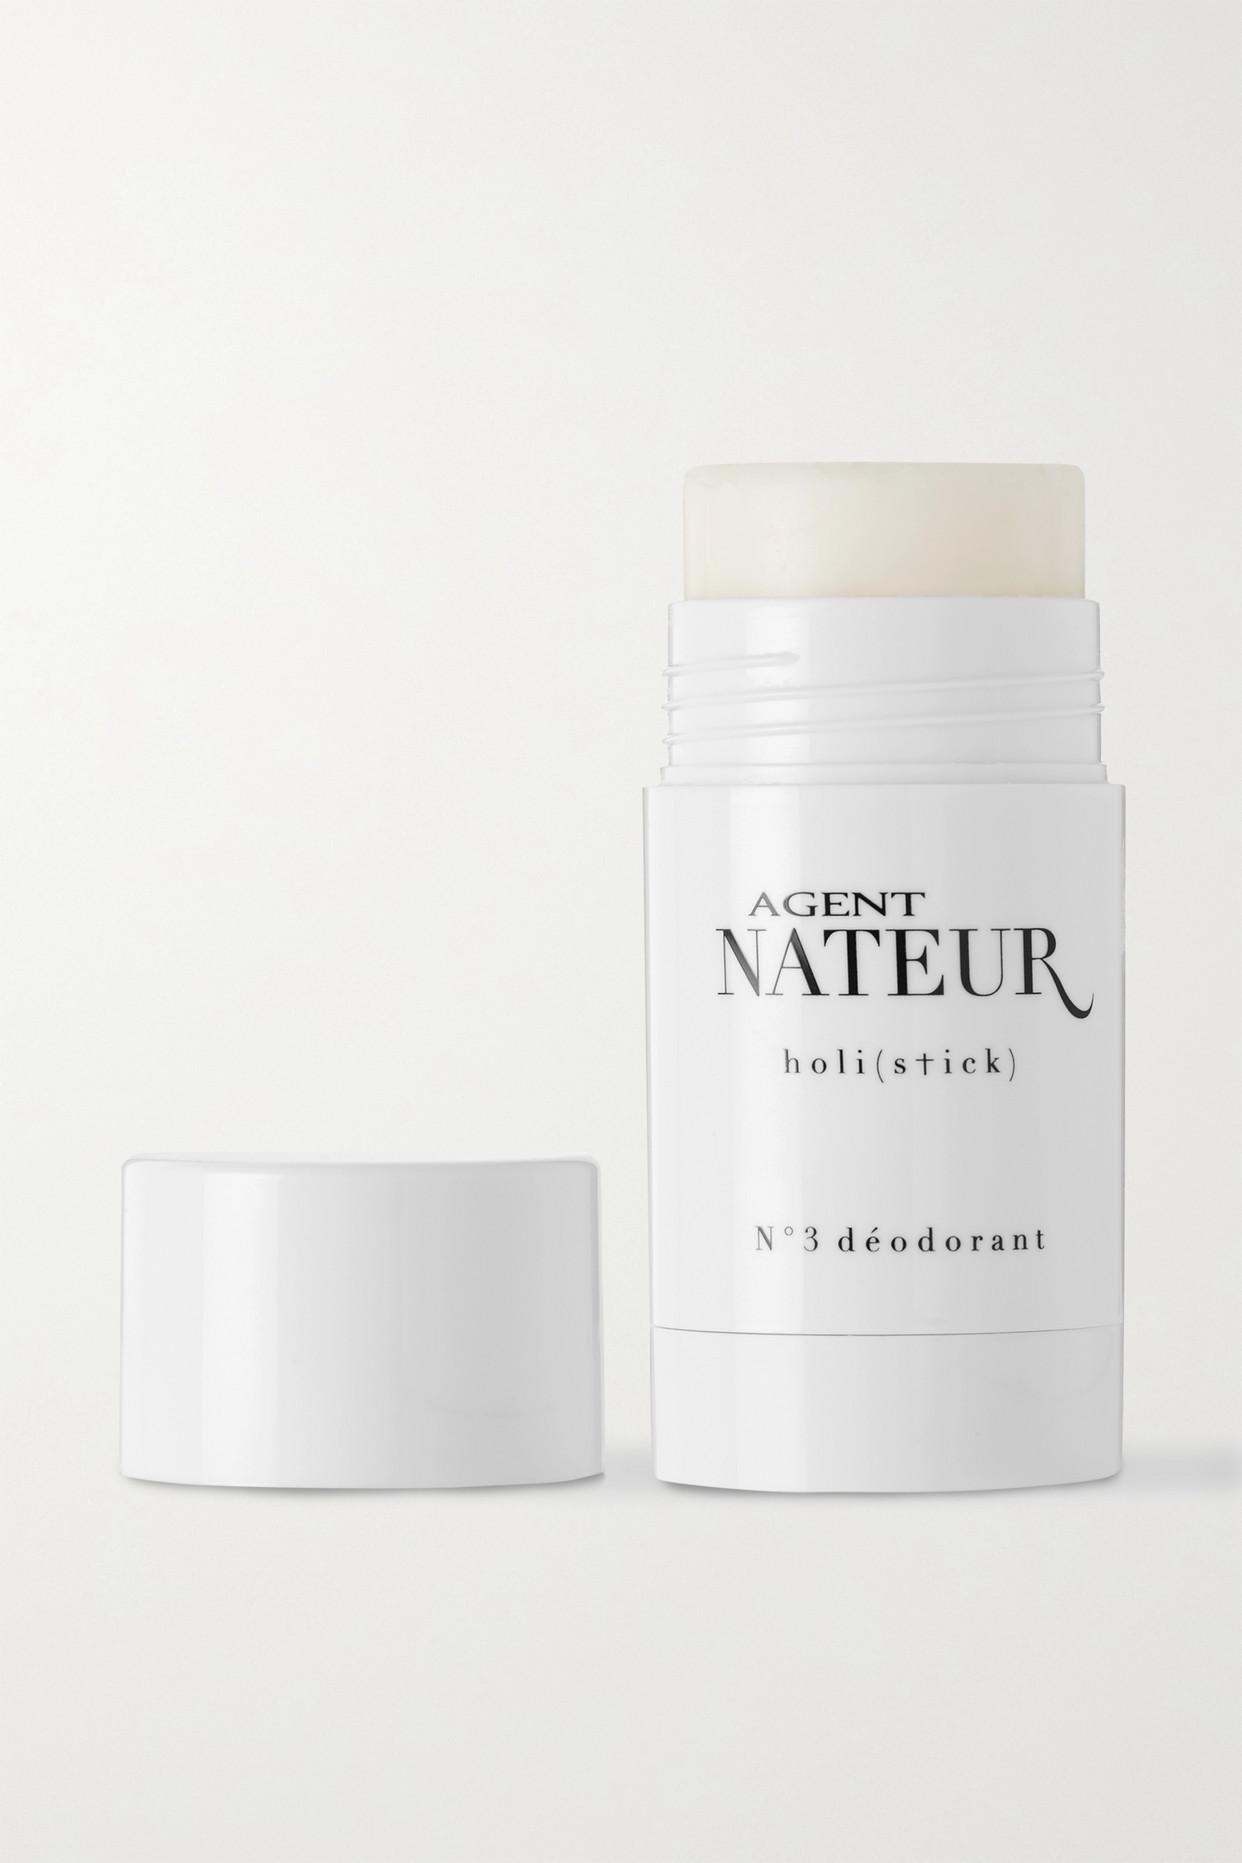 AGENT NATEUR - 健康生活香体棒,50ml - 无色 - one size